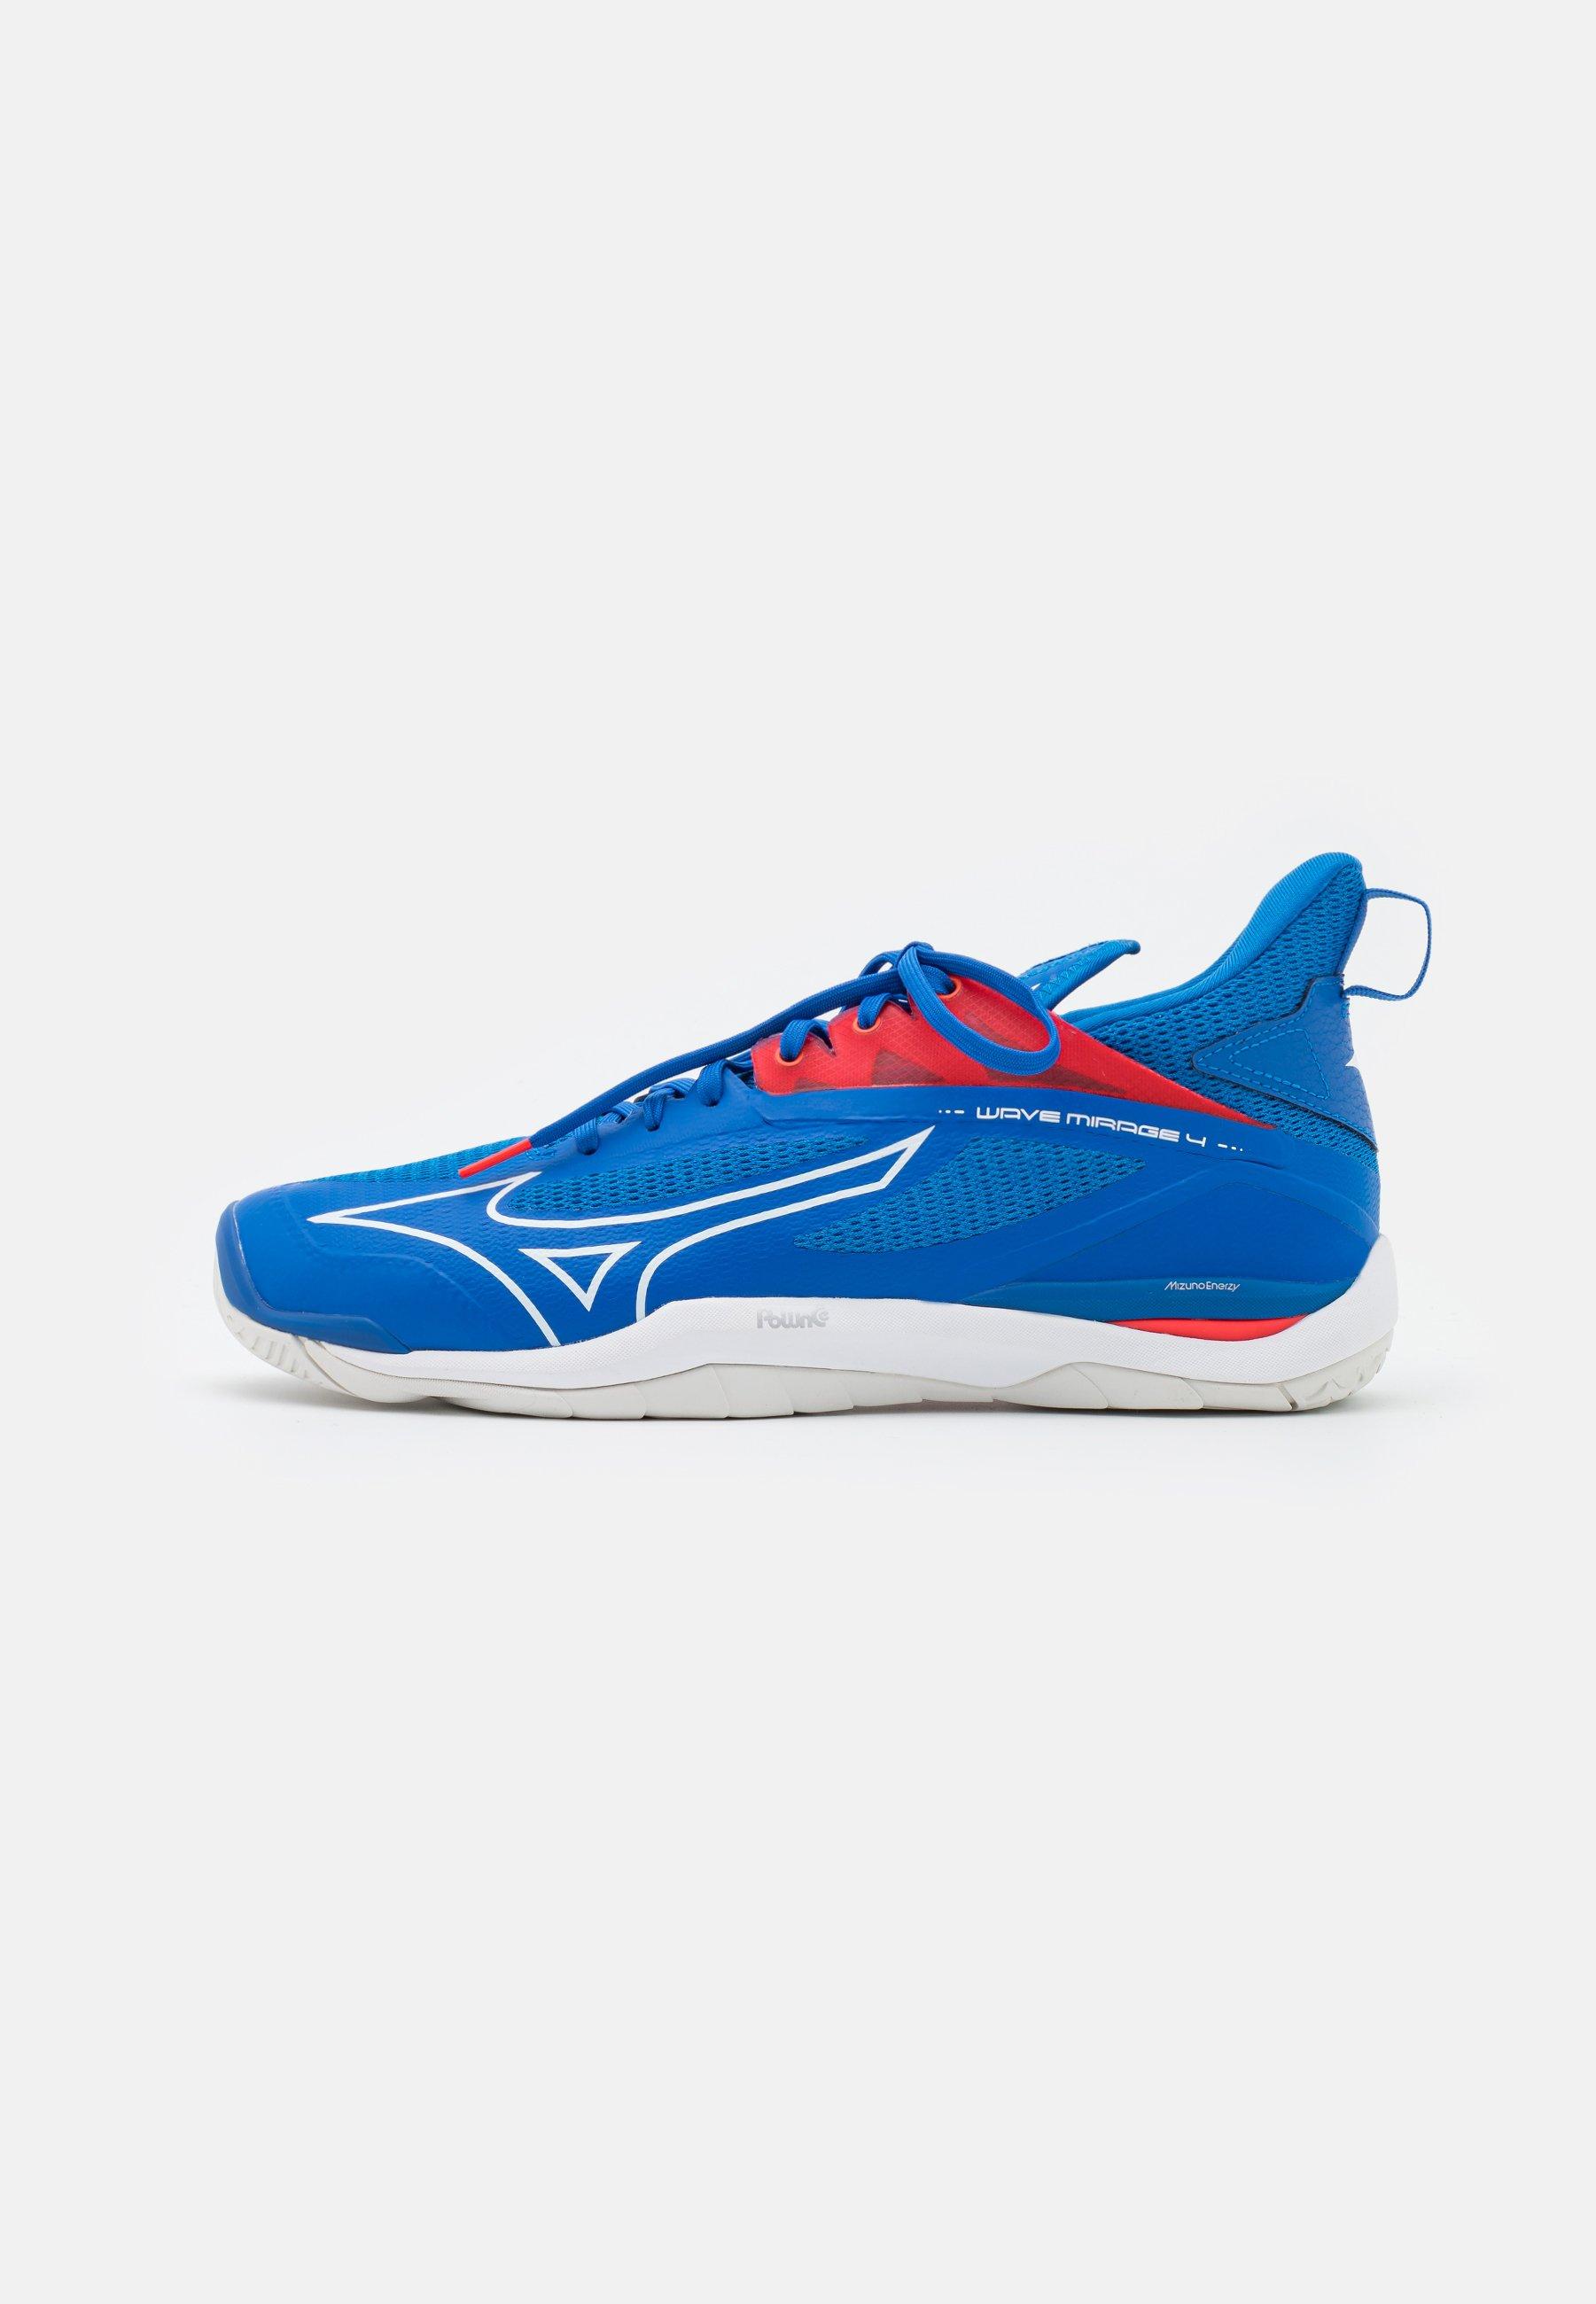 Men WAVE MIRAGE 4 - Handball shoes